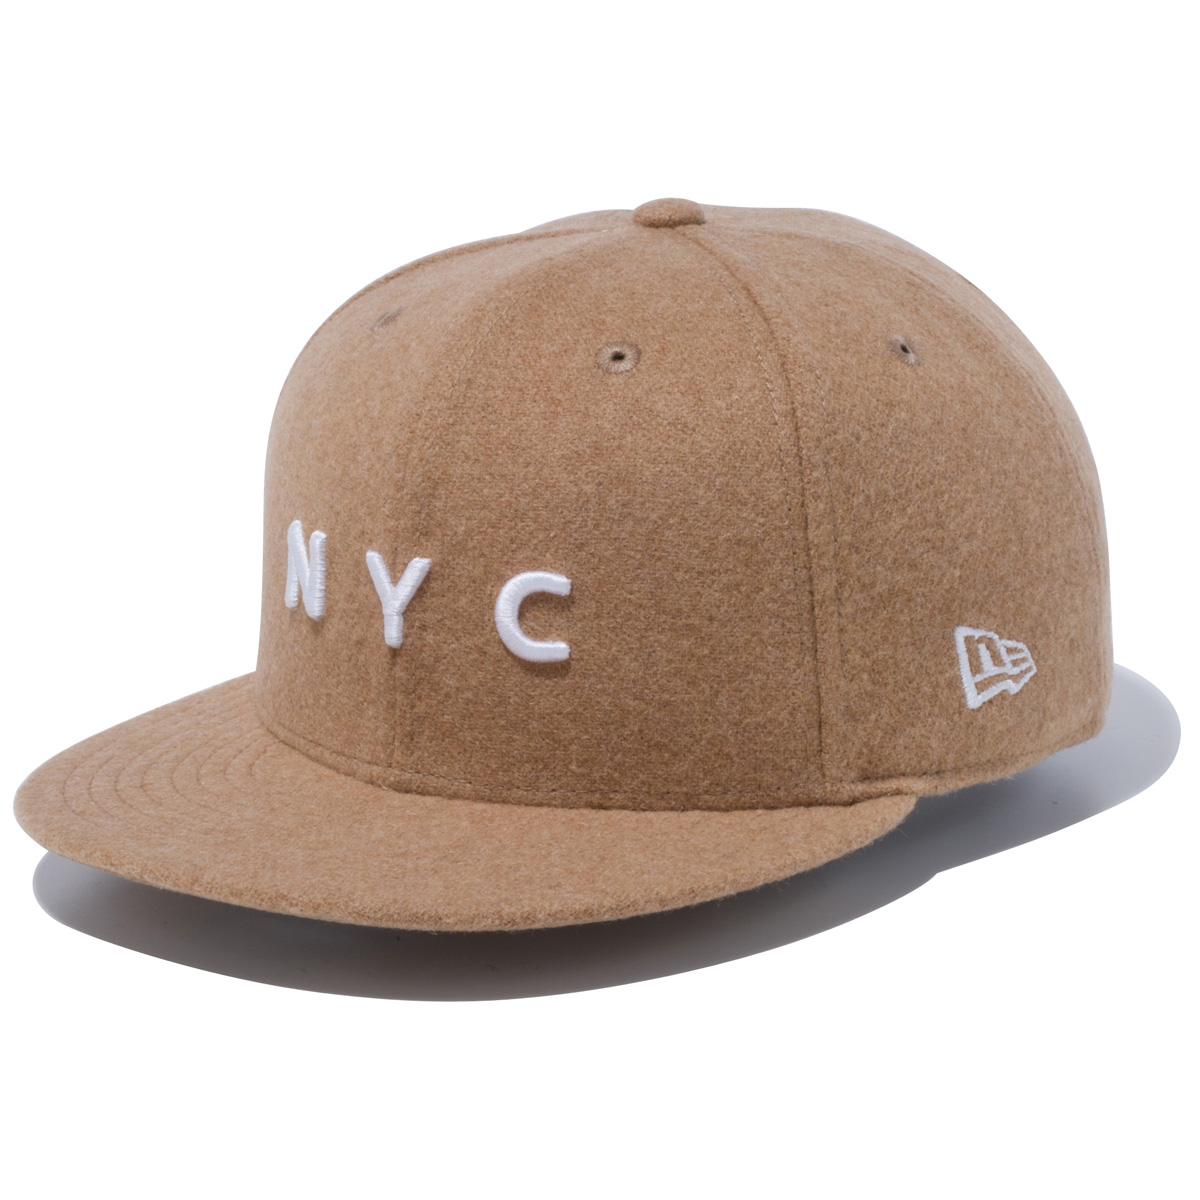 950 MELTON NYC キャップ